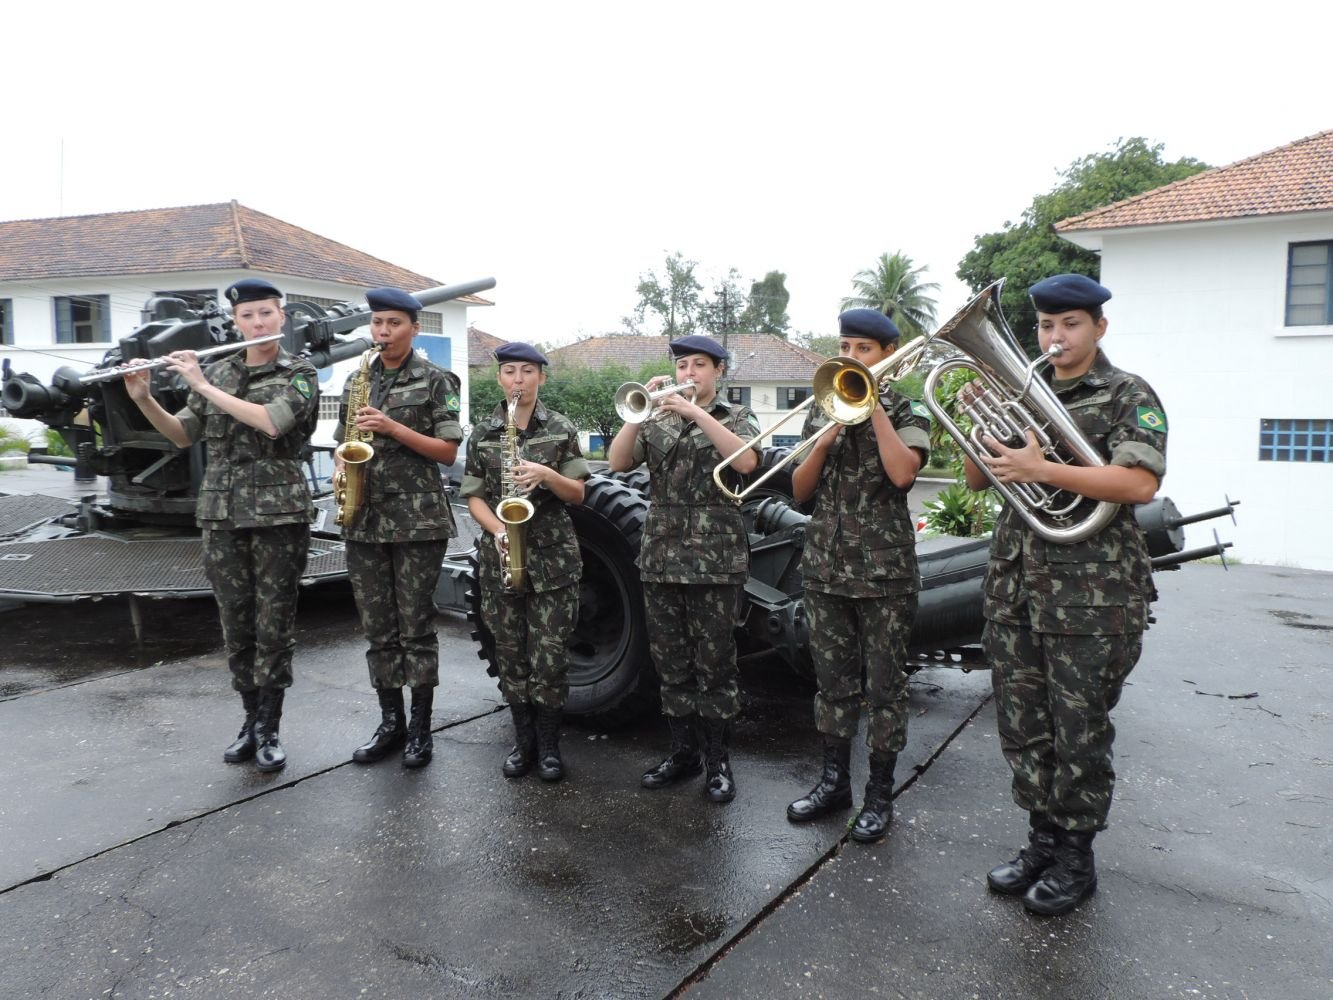 Brazil: Army enrolls first women in course for Musician Sergeants